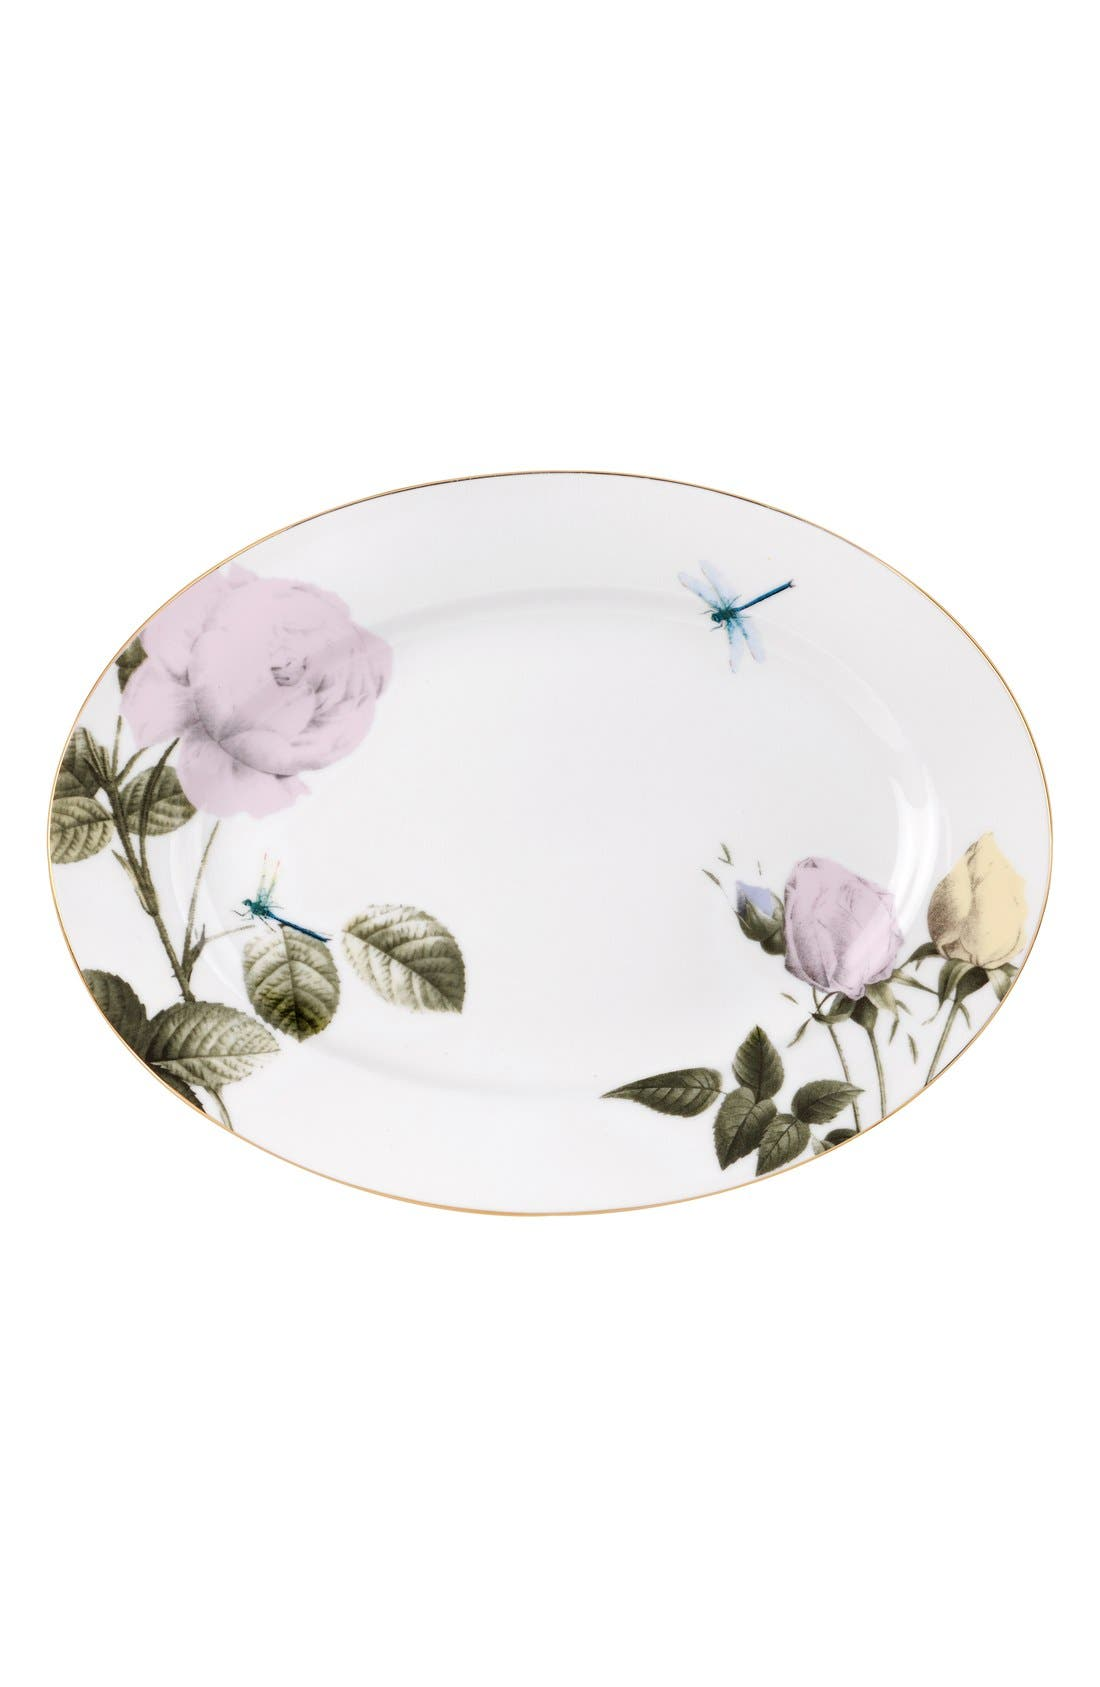 Alternate Image 1 Selected - Portmeirion x Ted Baker 'Rosie Lee' Oval China Platter